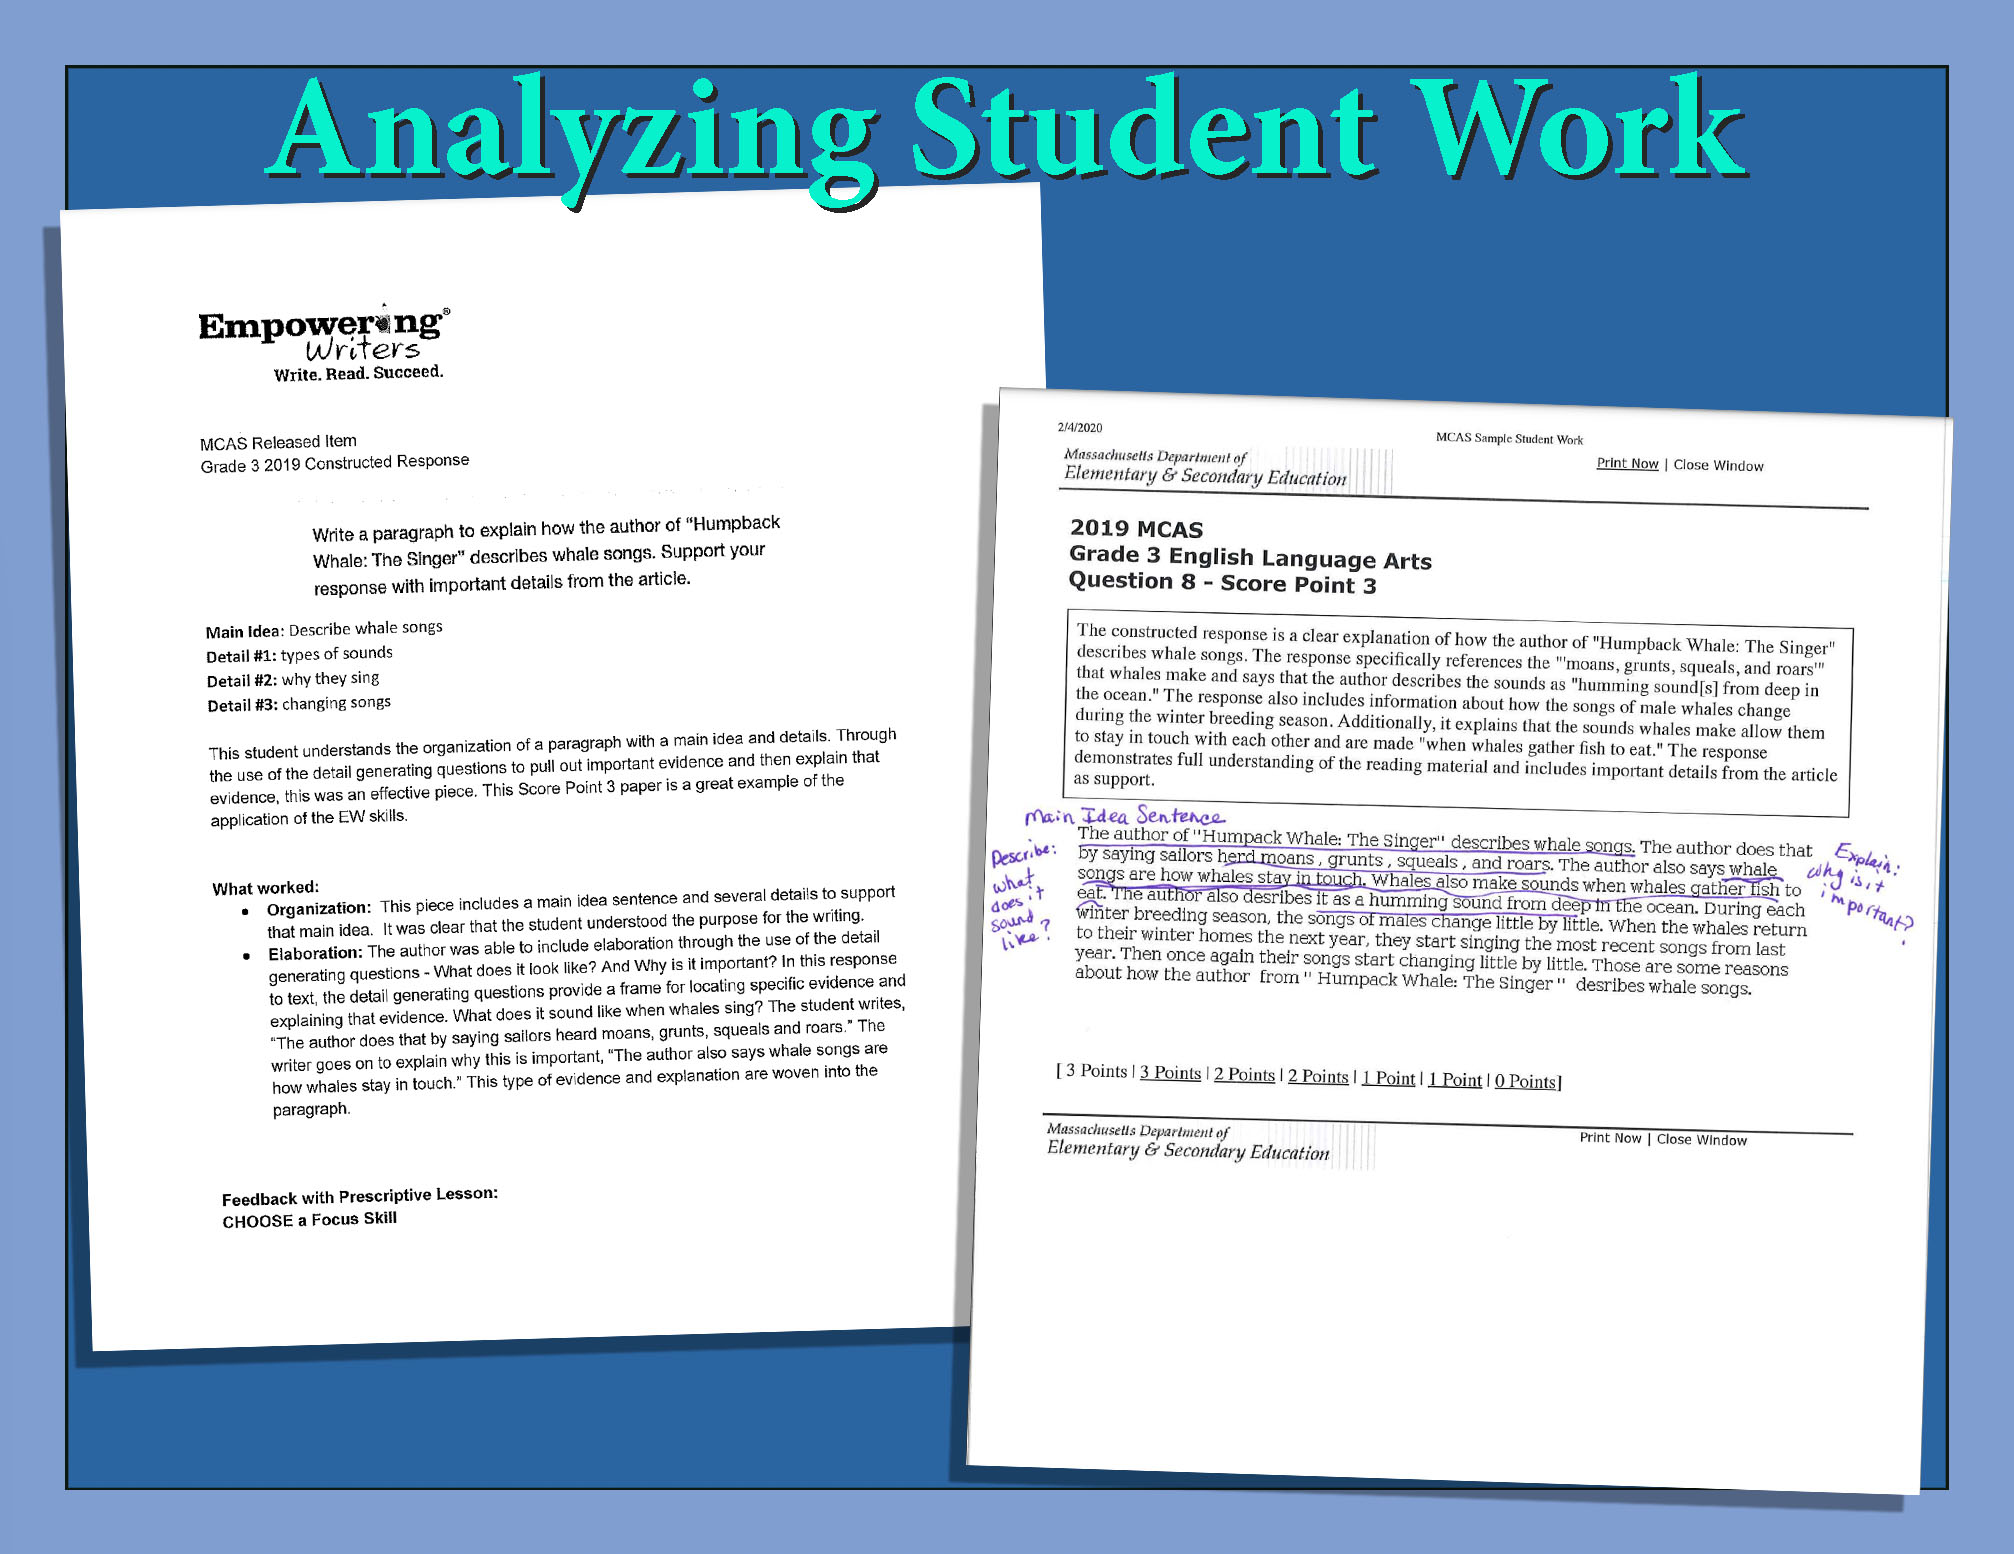 Analyze Student Sample Image